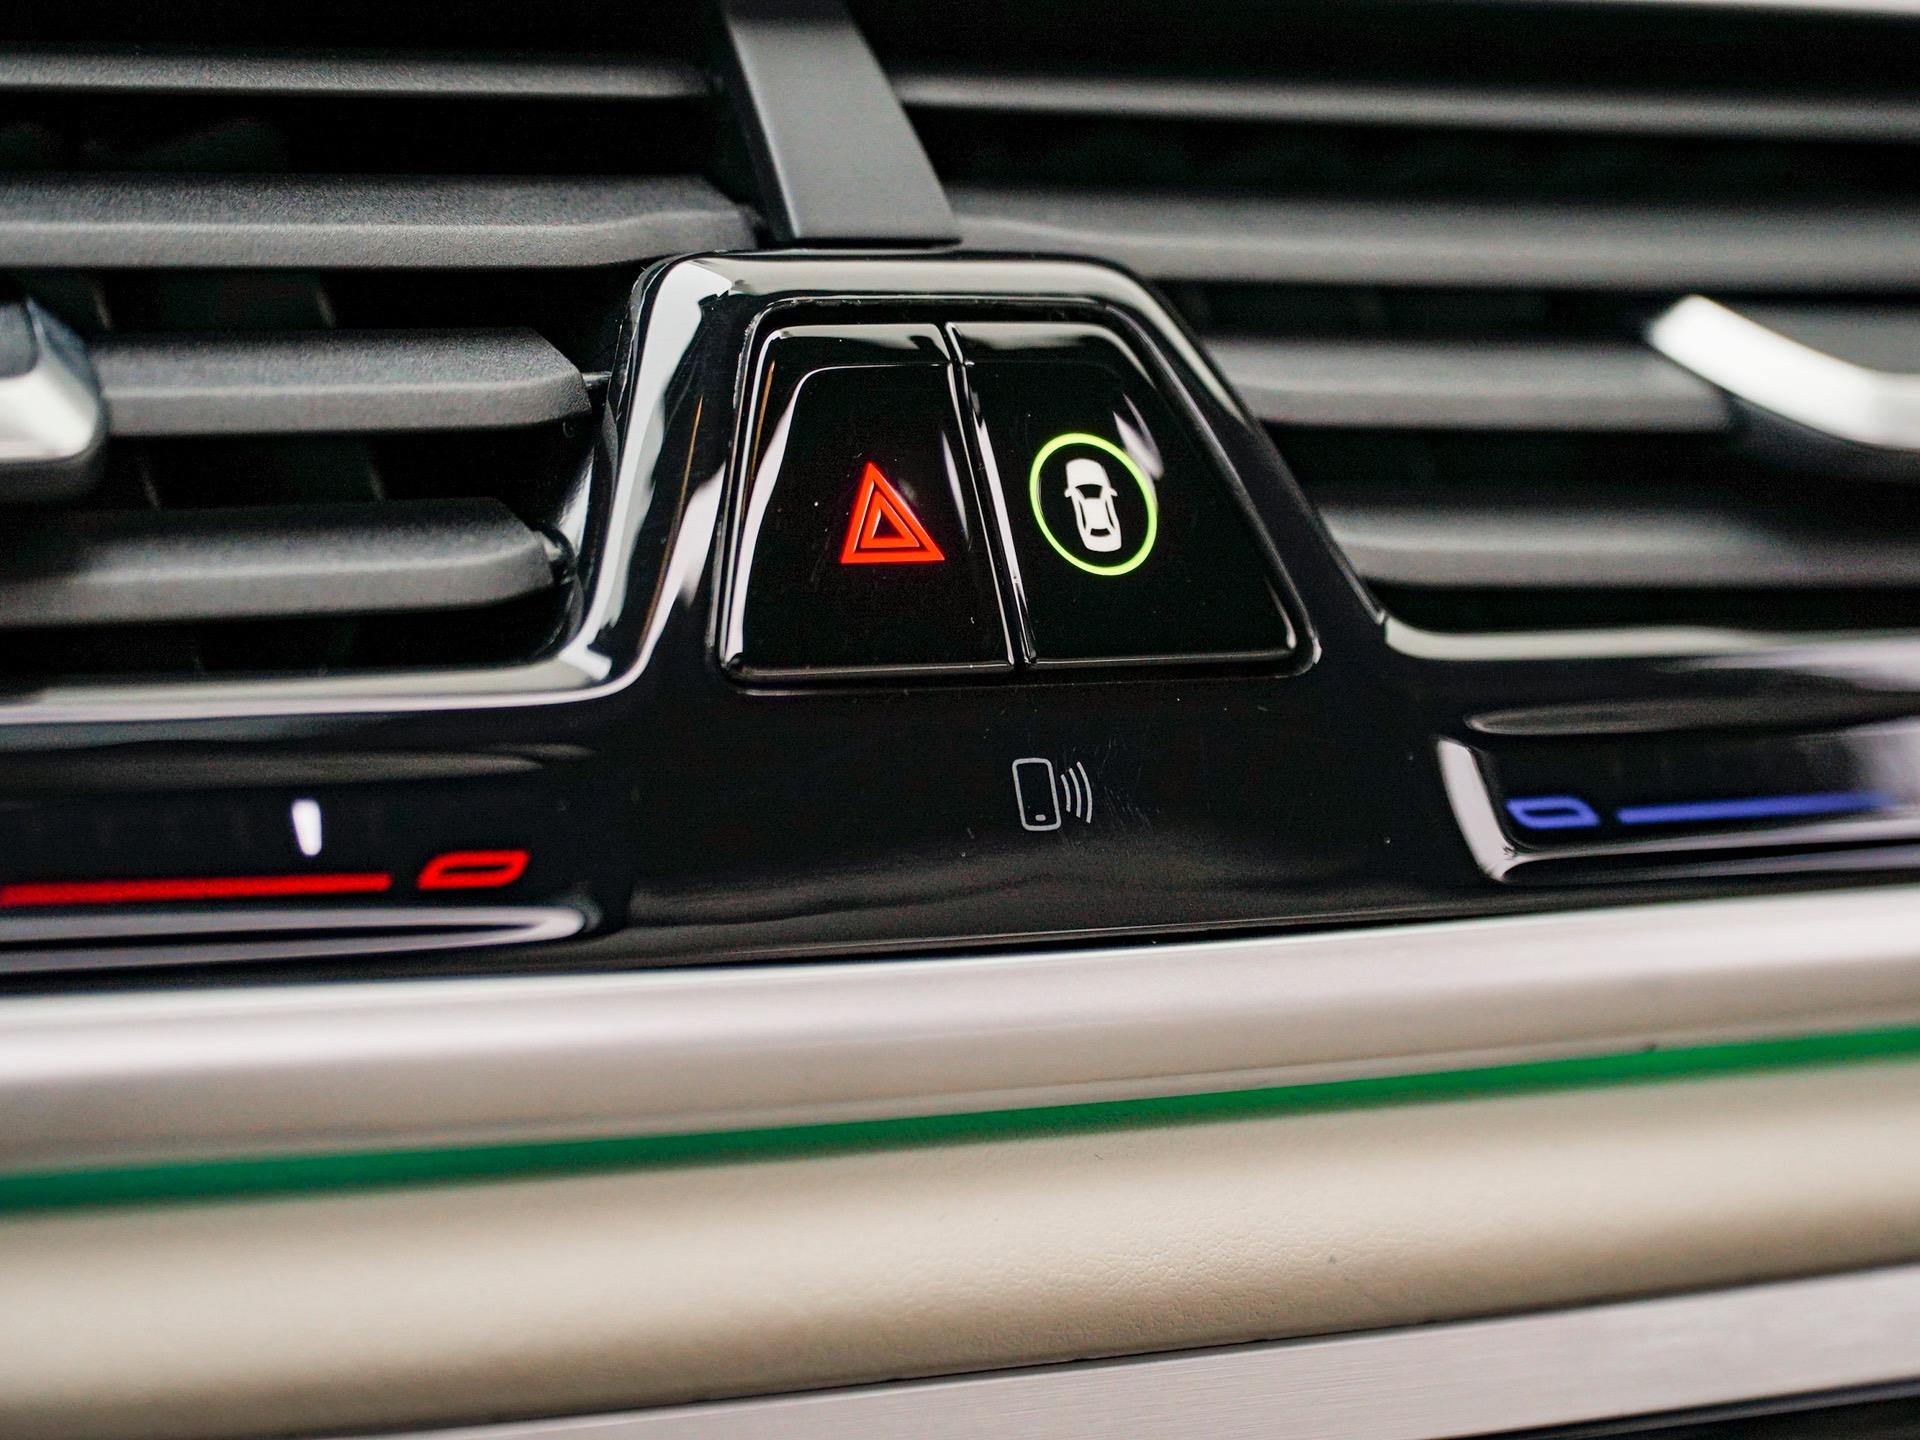 Used-2017-BMW-7-Series-ALPINA-B7-xDrive